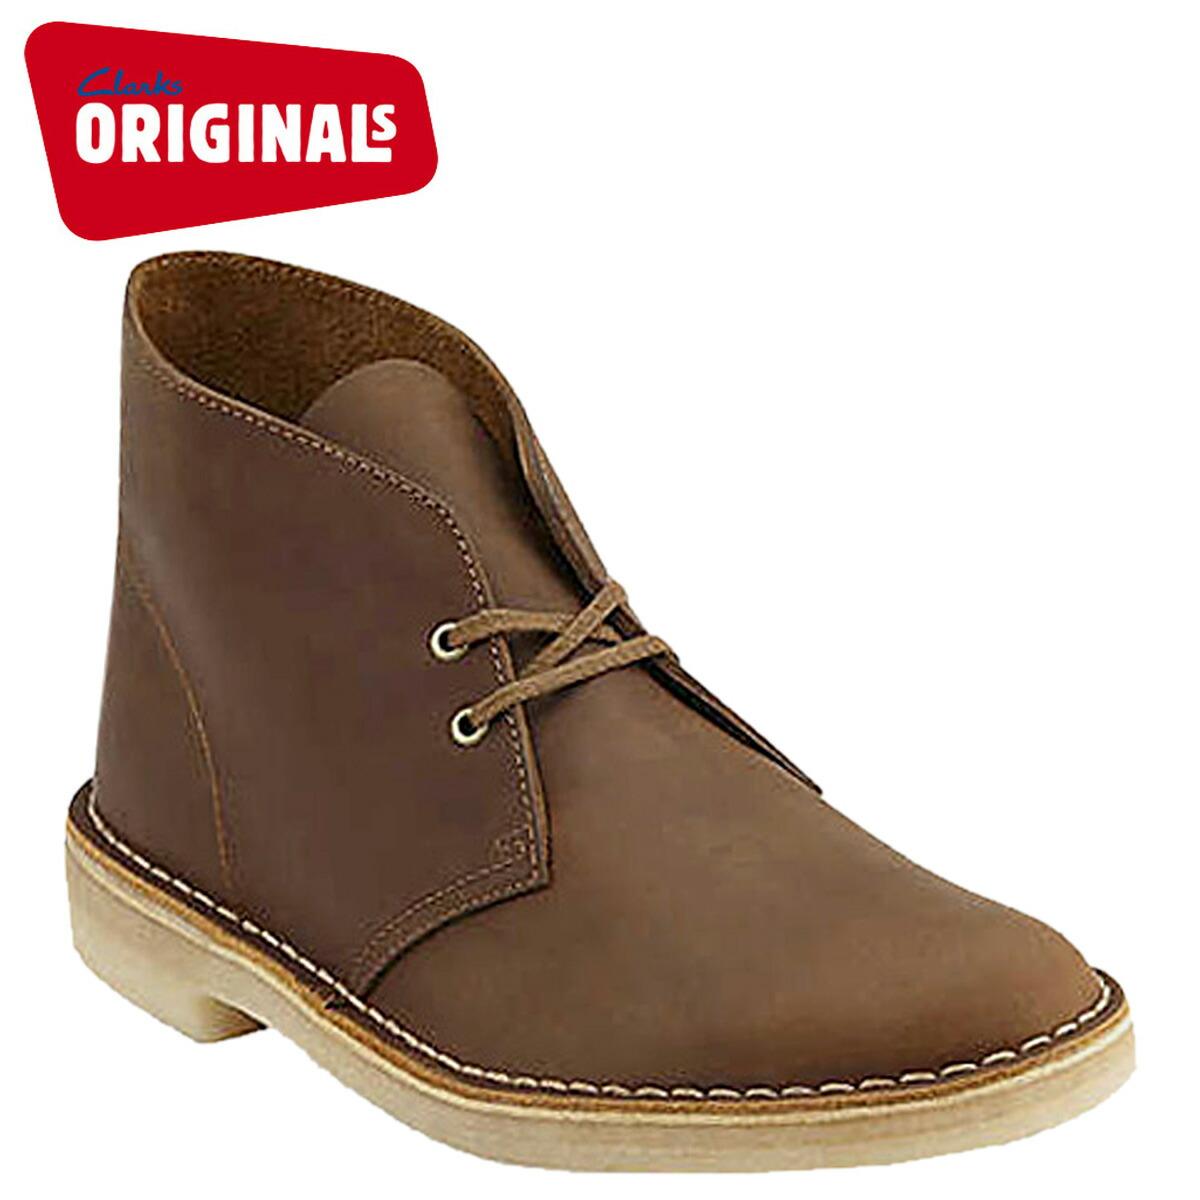 sugar online shop rakuten global market clarks originals desert boots 78358 clarks originals. Black Bedroom Furniture Sets. Home Design Ideas